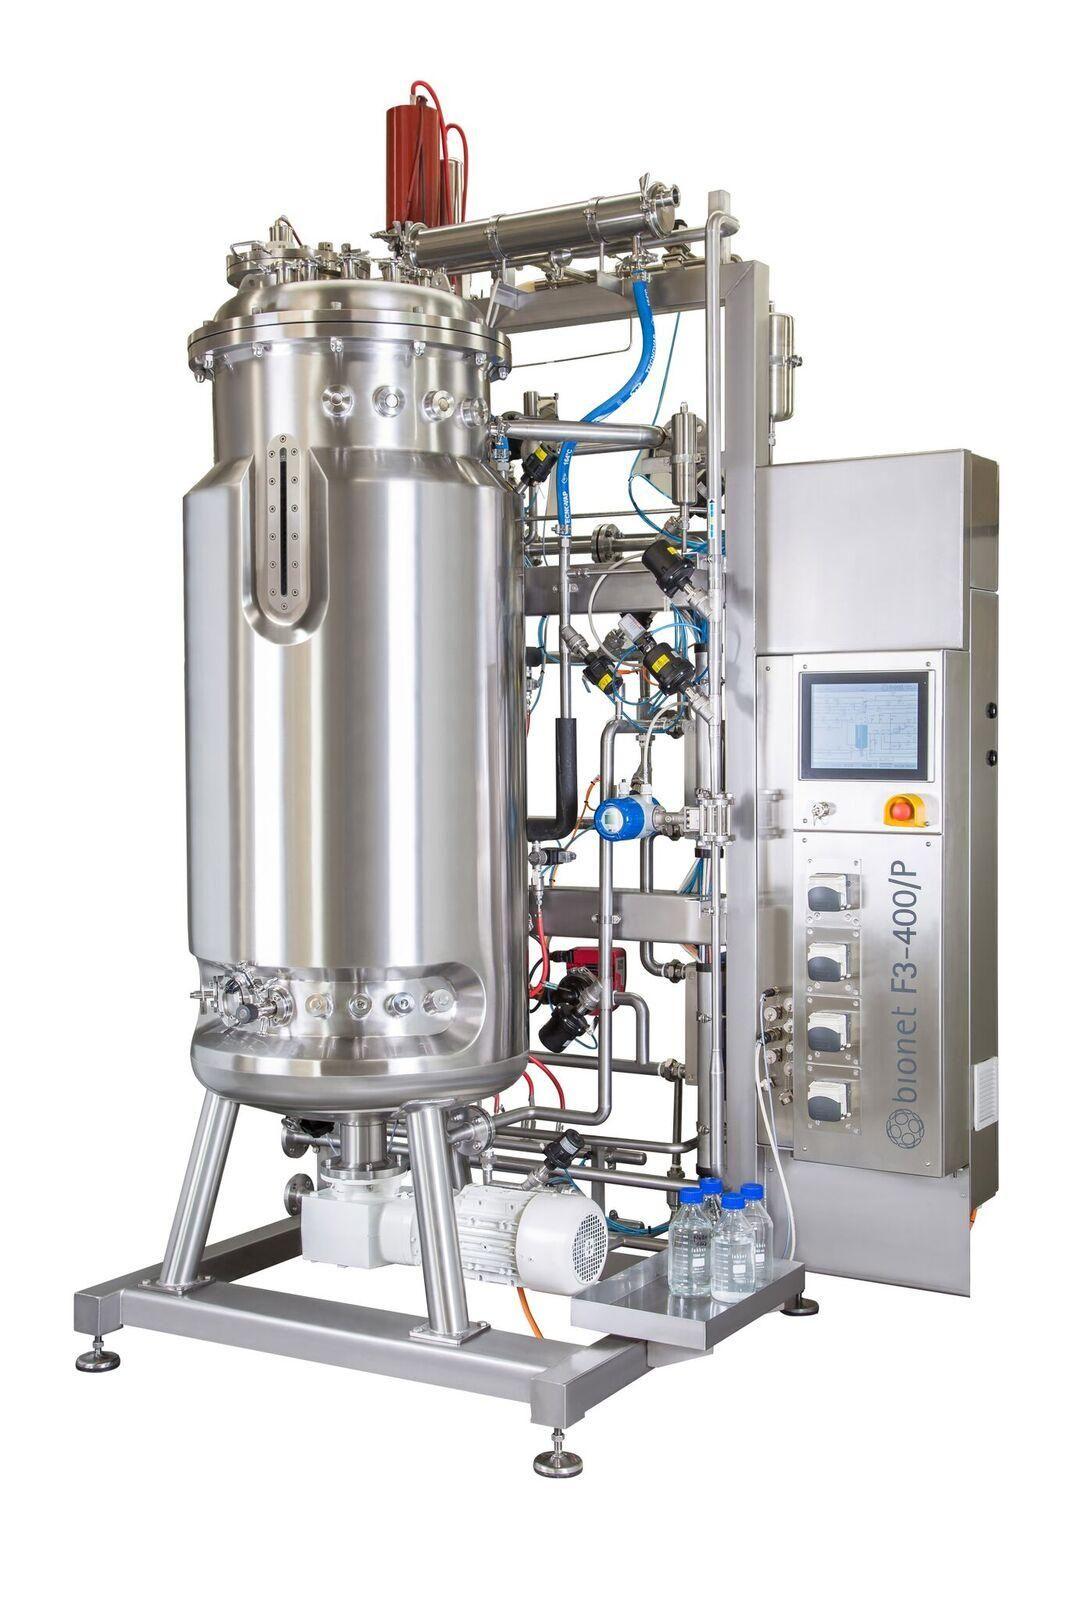 Fermenter/Bioreactor, SIP, CIP 50-500 Litres, BioNet (Spain)